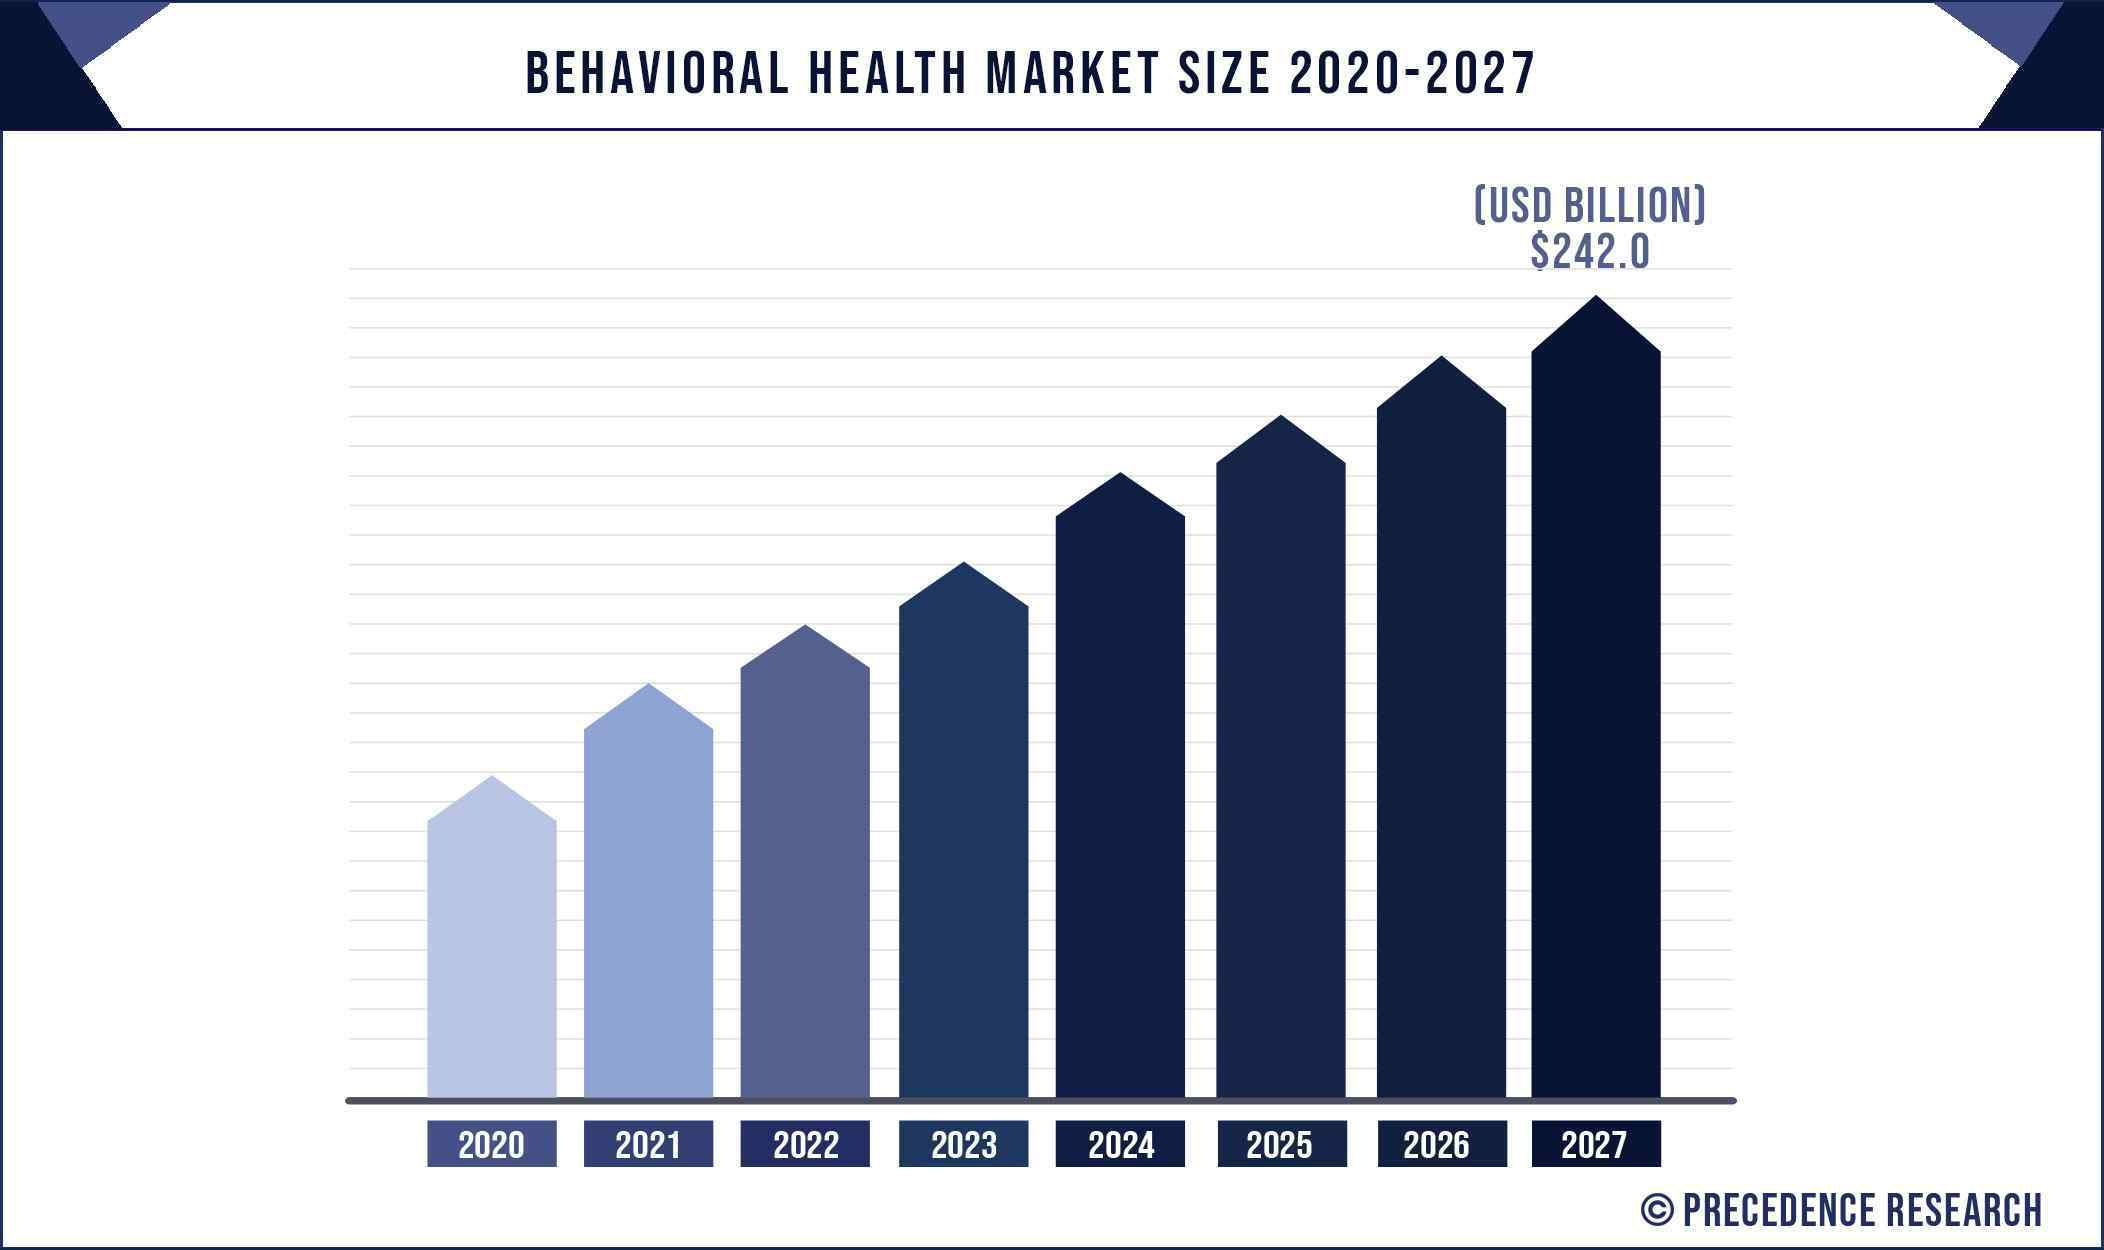 Behavioral Health Market Size 2020 to 2027